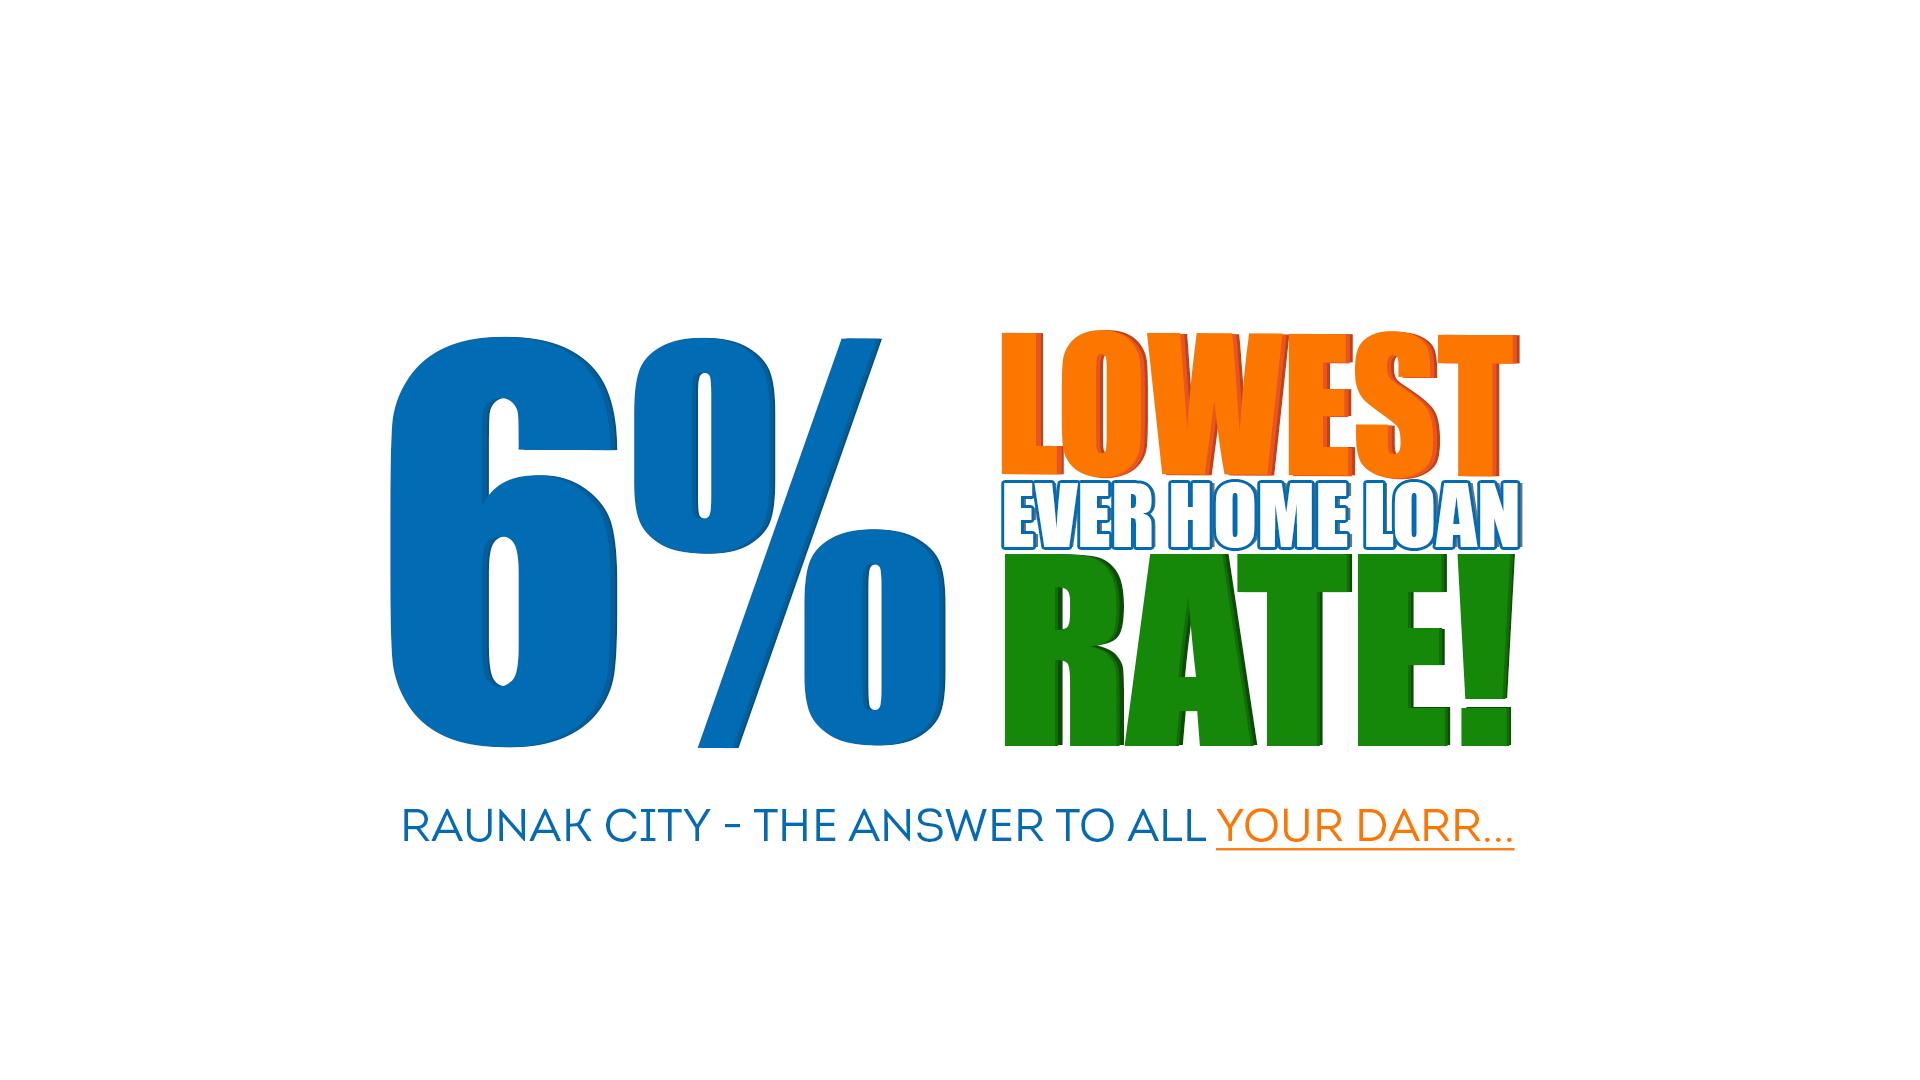 Raunak-City-Darr-campaingn